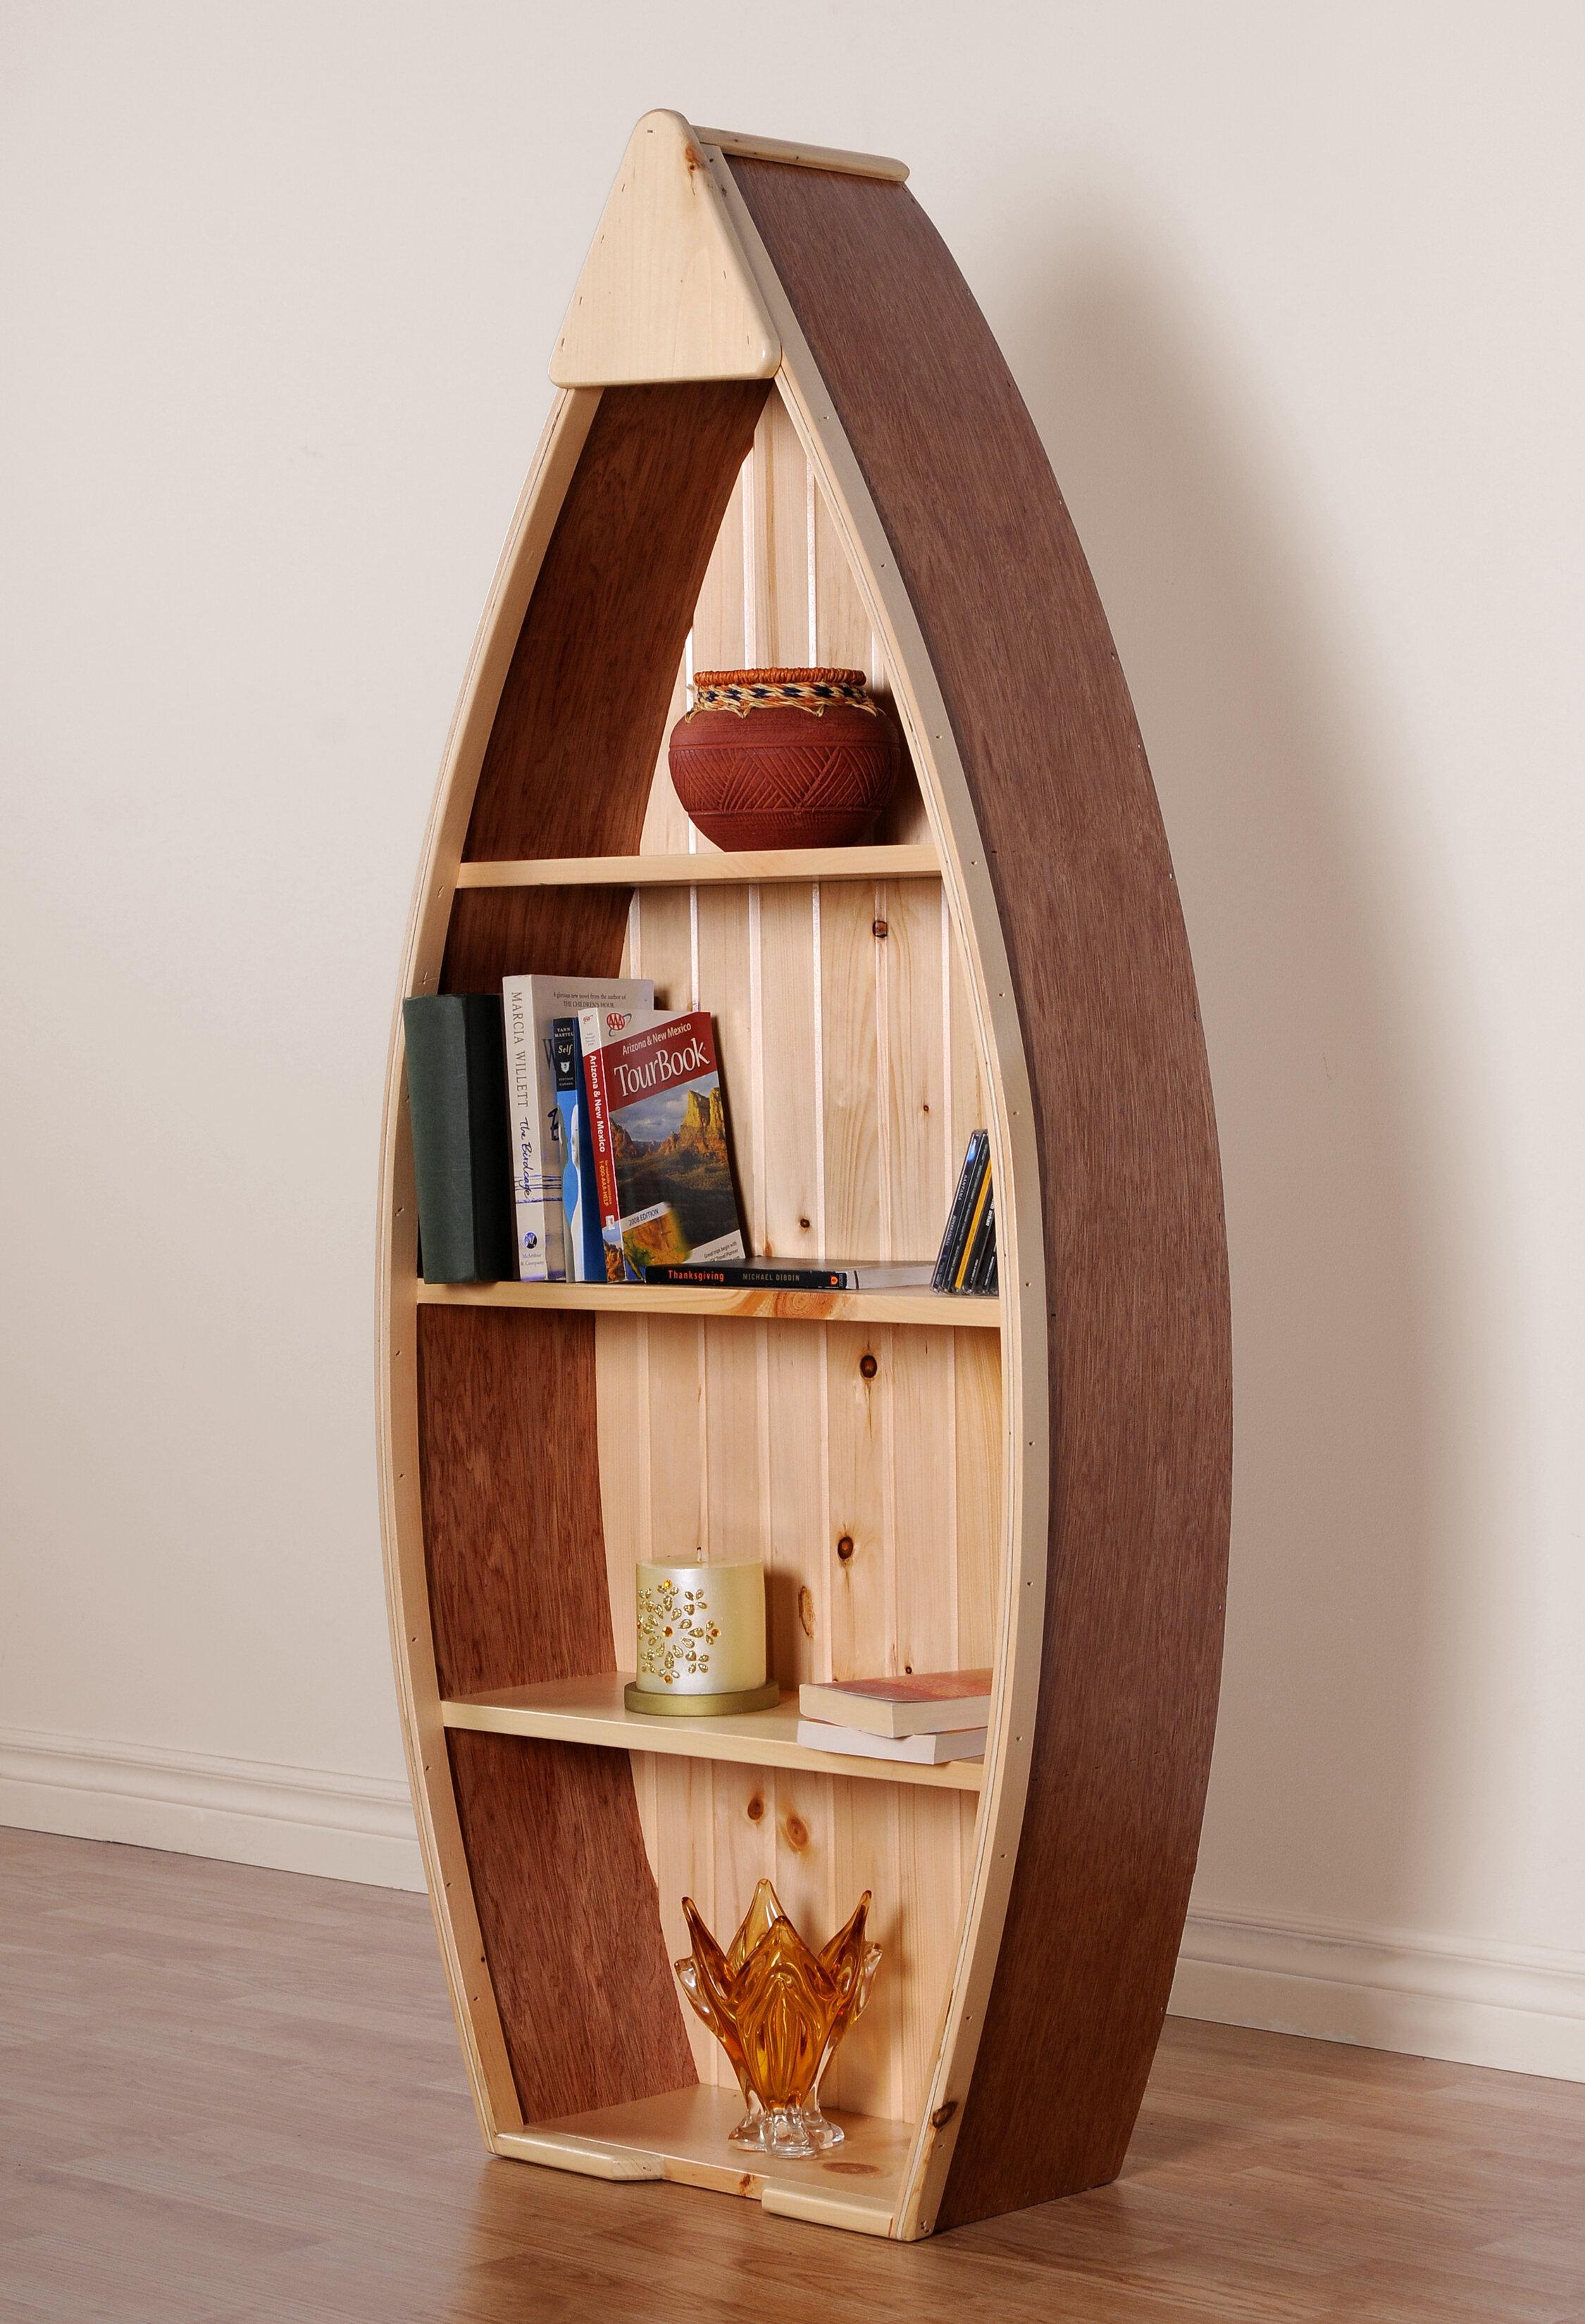 Rabin Canoe Boat Bookcase